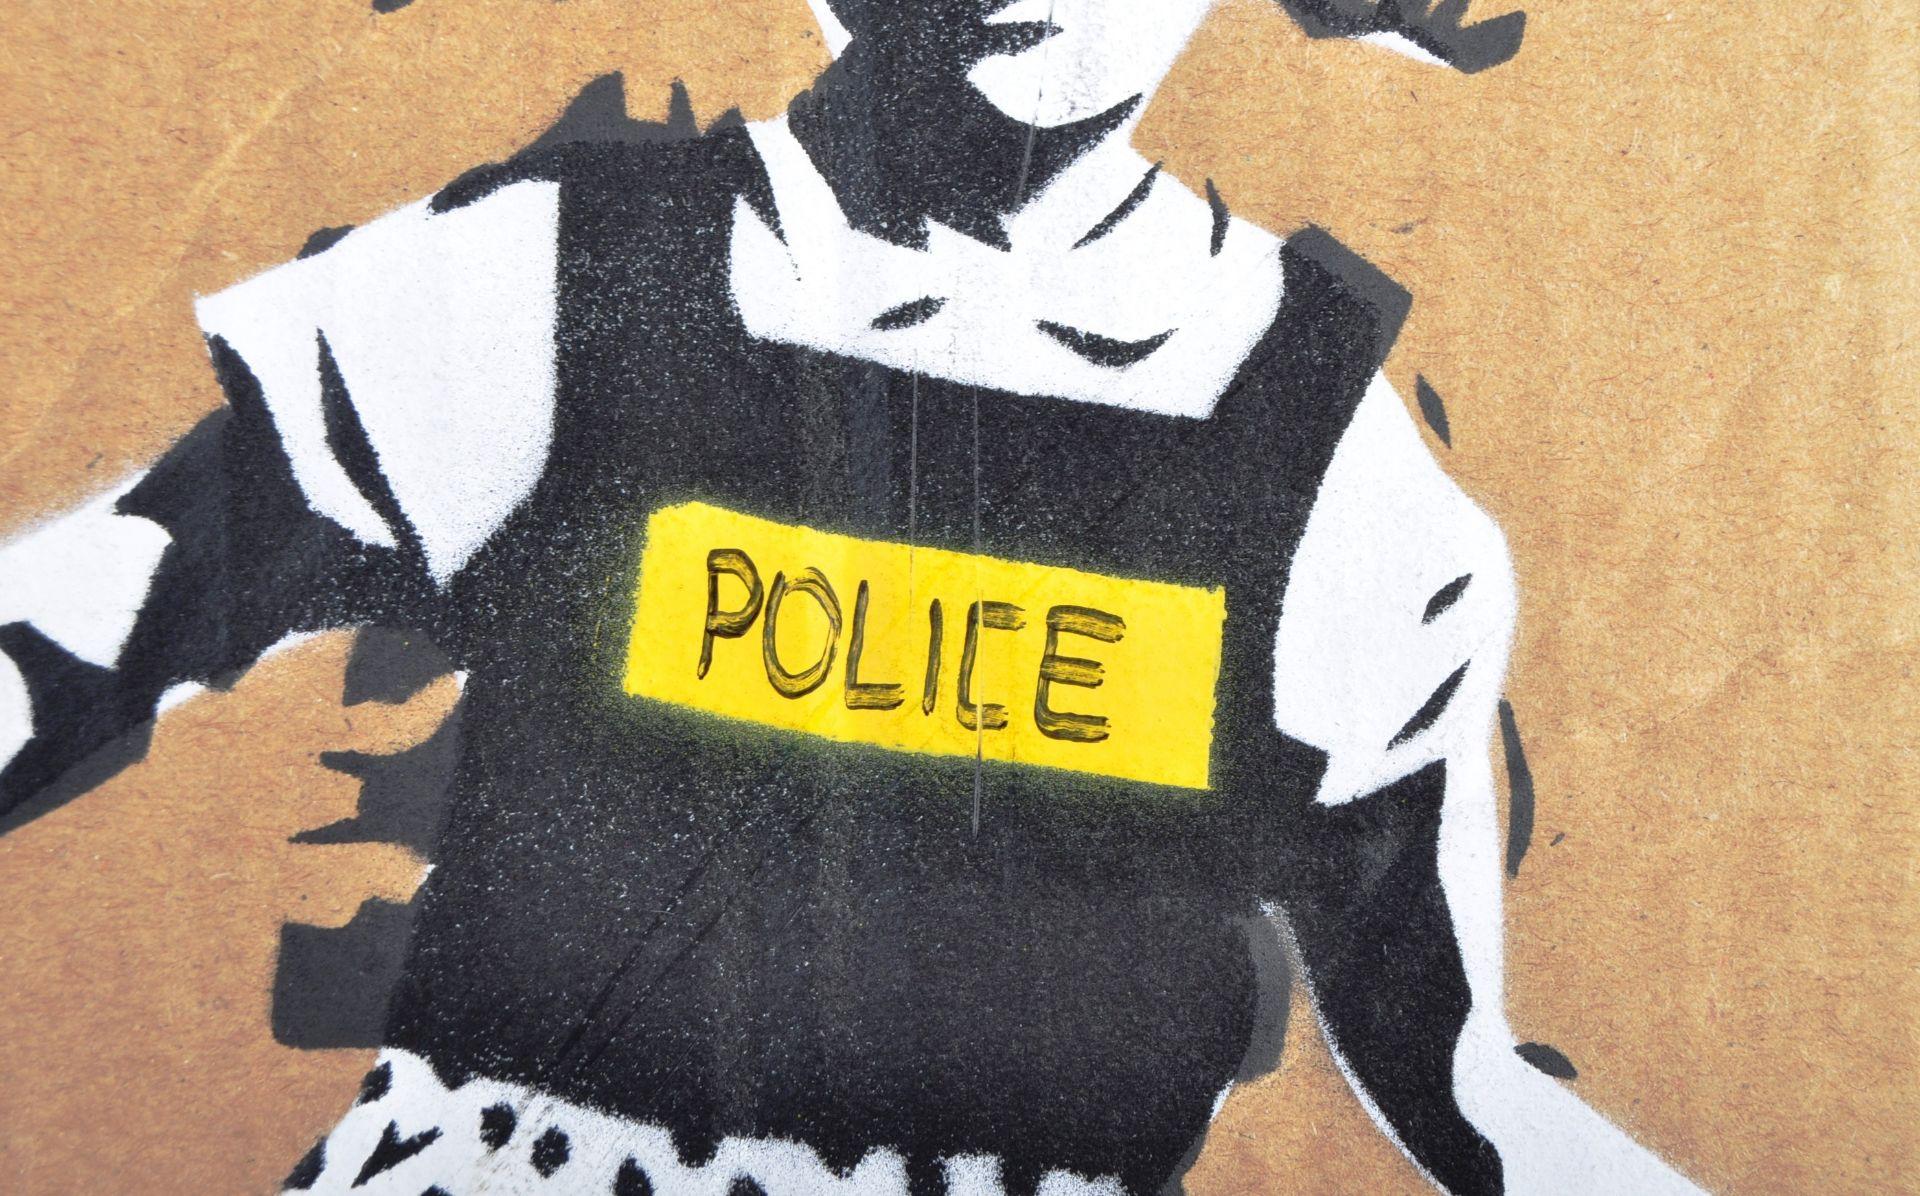 BANKSY - DISMALAND 2015 - JACK & JILL (POLICE KIDS) - Image 3 of 4